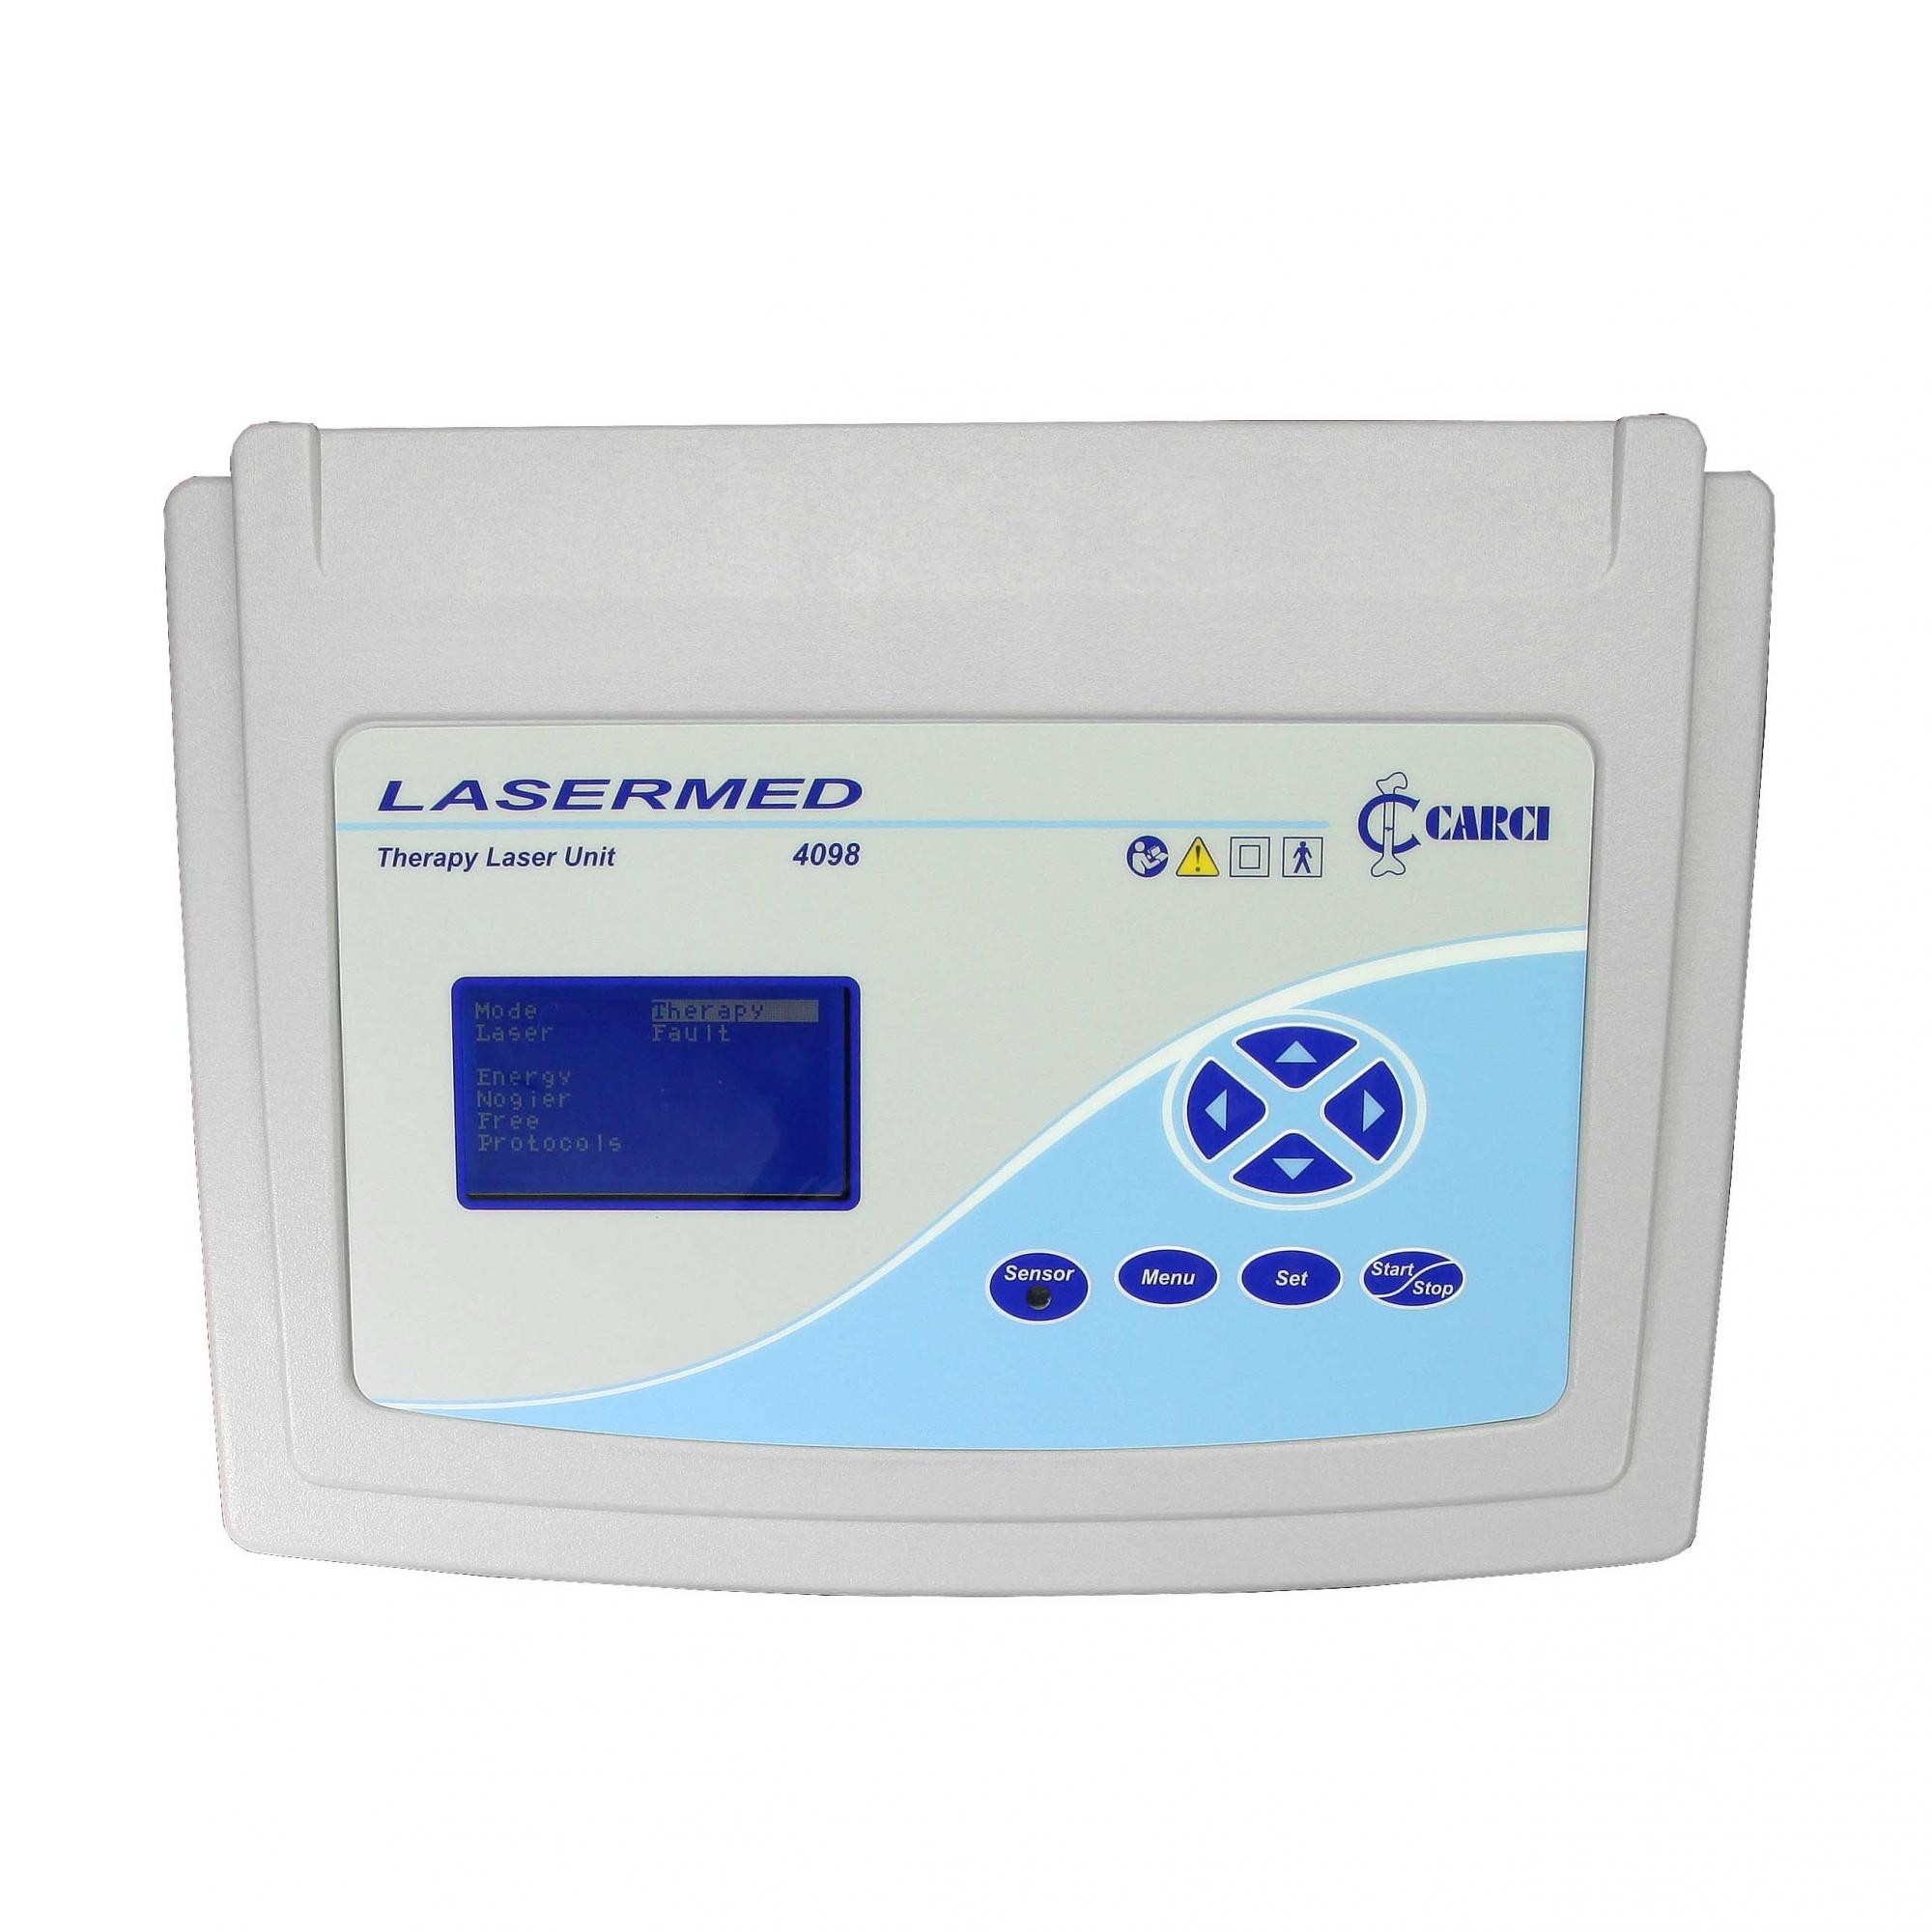 Laser para fisioterapia - LASERMED - 4098LS